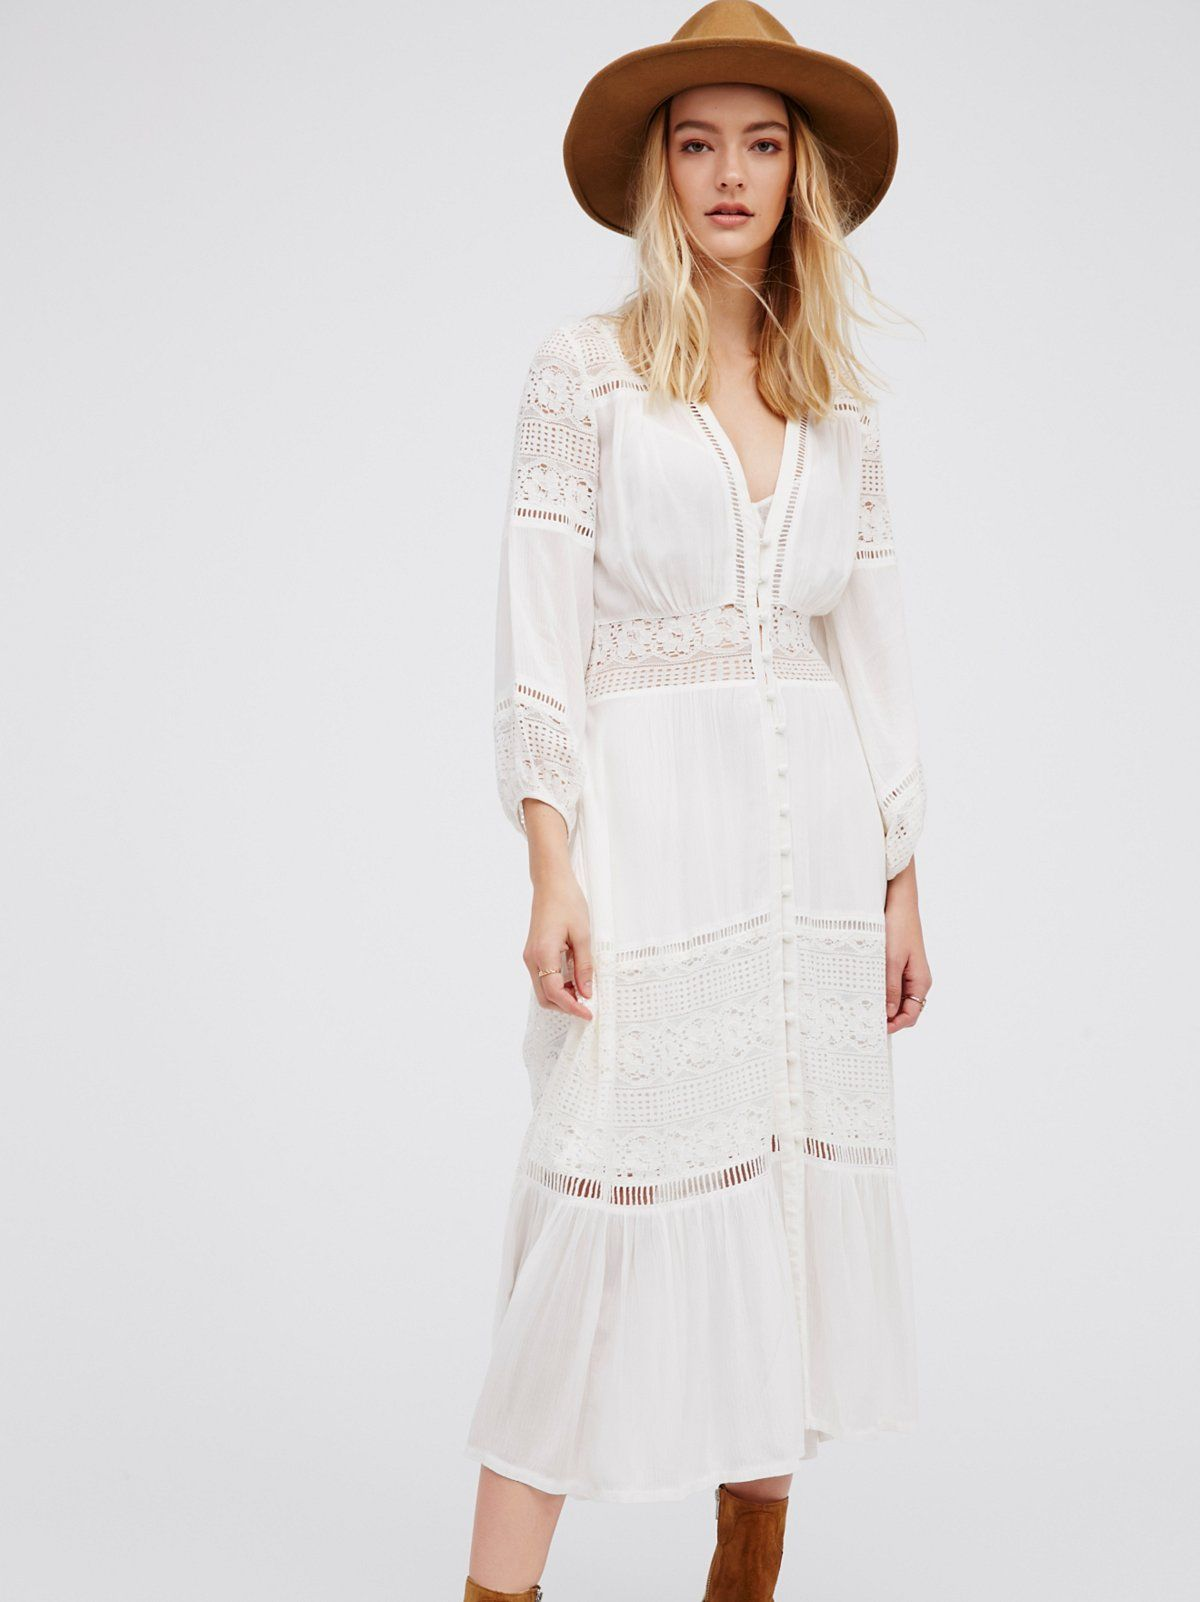 Olivia Luxe Lace Midi Dress Lace Dress Boho Long Sleeve Elegant Dresses Luxe Lace [ 1602 x 1200 Pixel ]